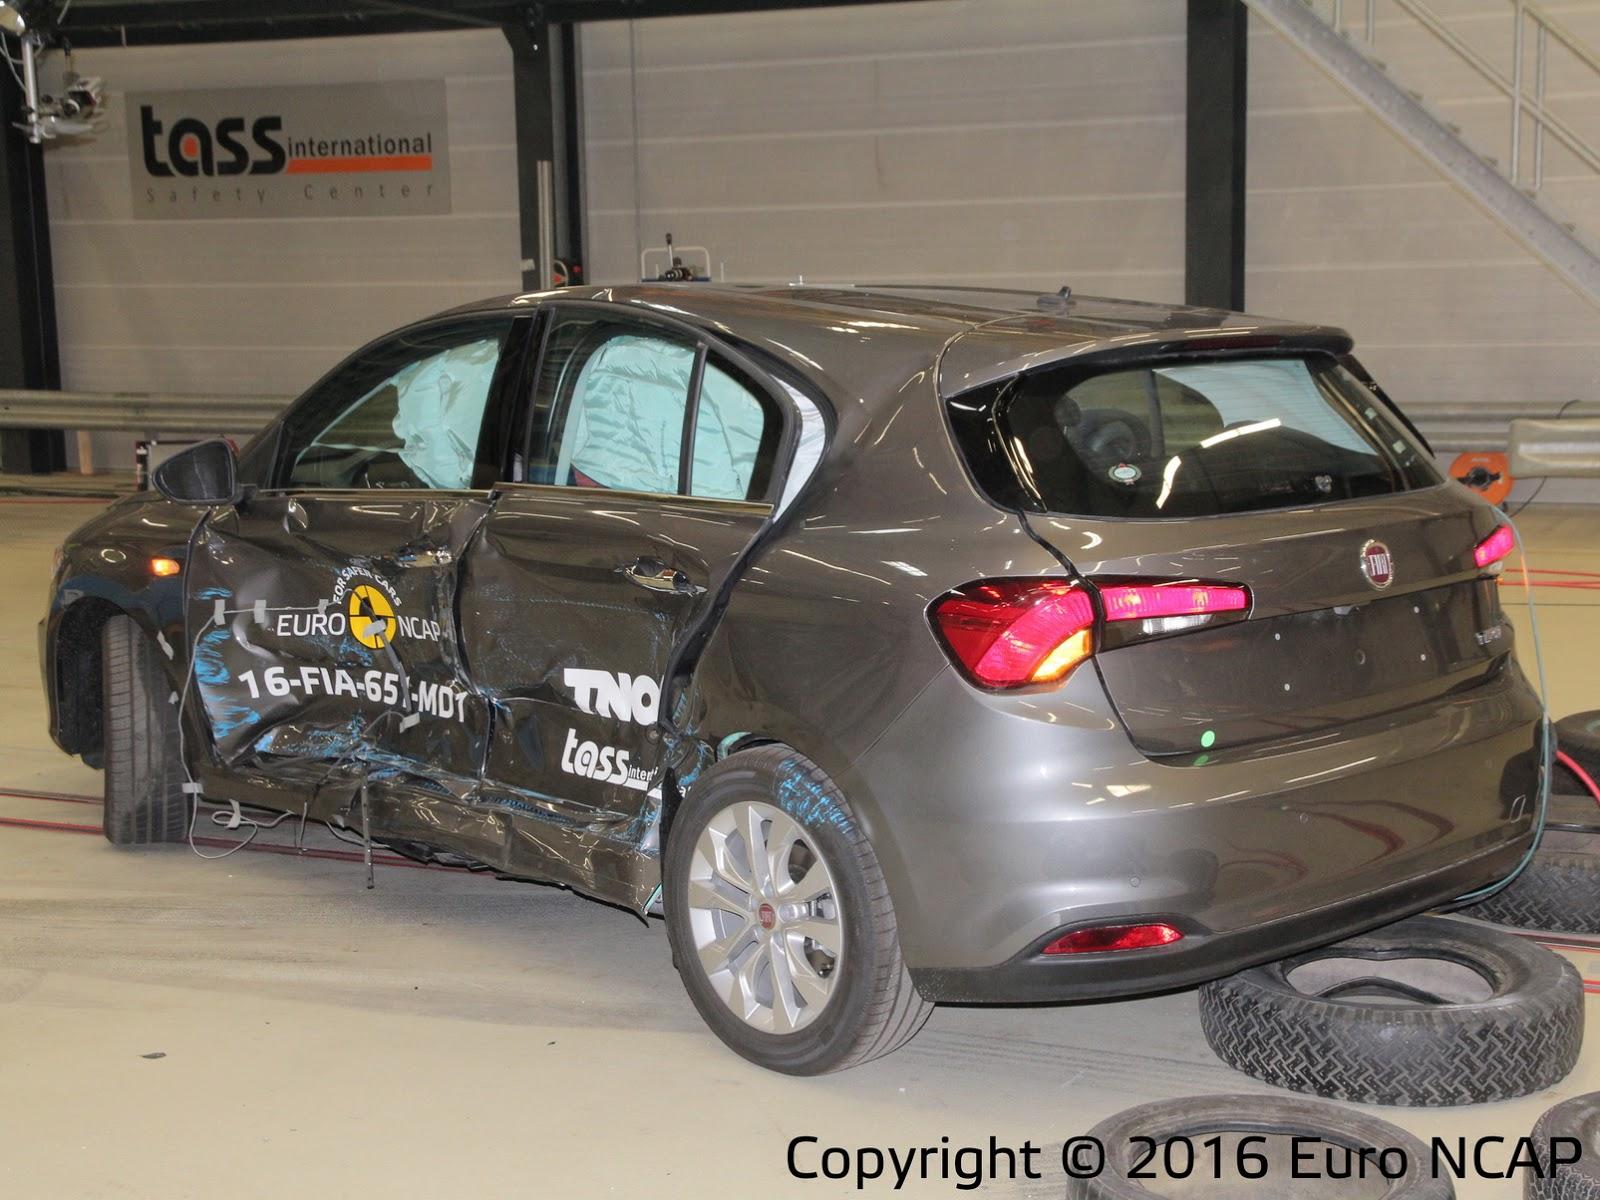 ncap in test news fiat euroncap euro gets punto zero stars crash last